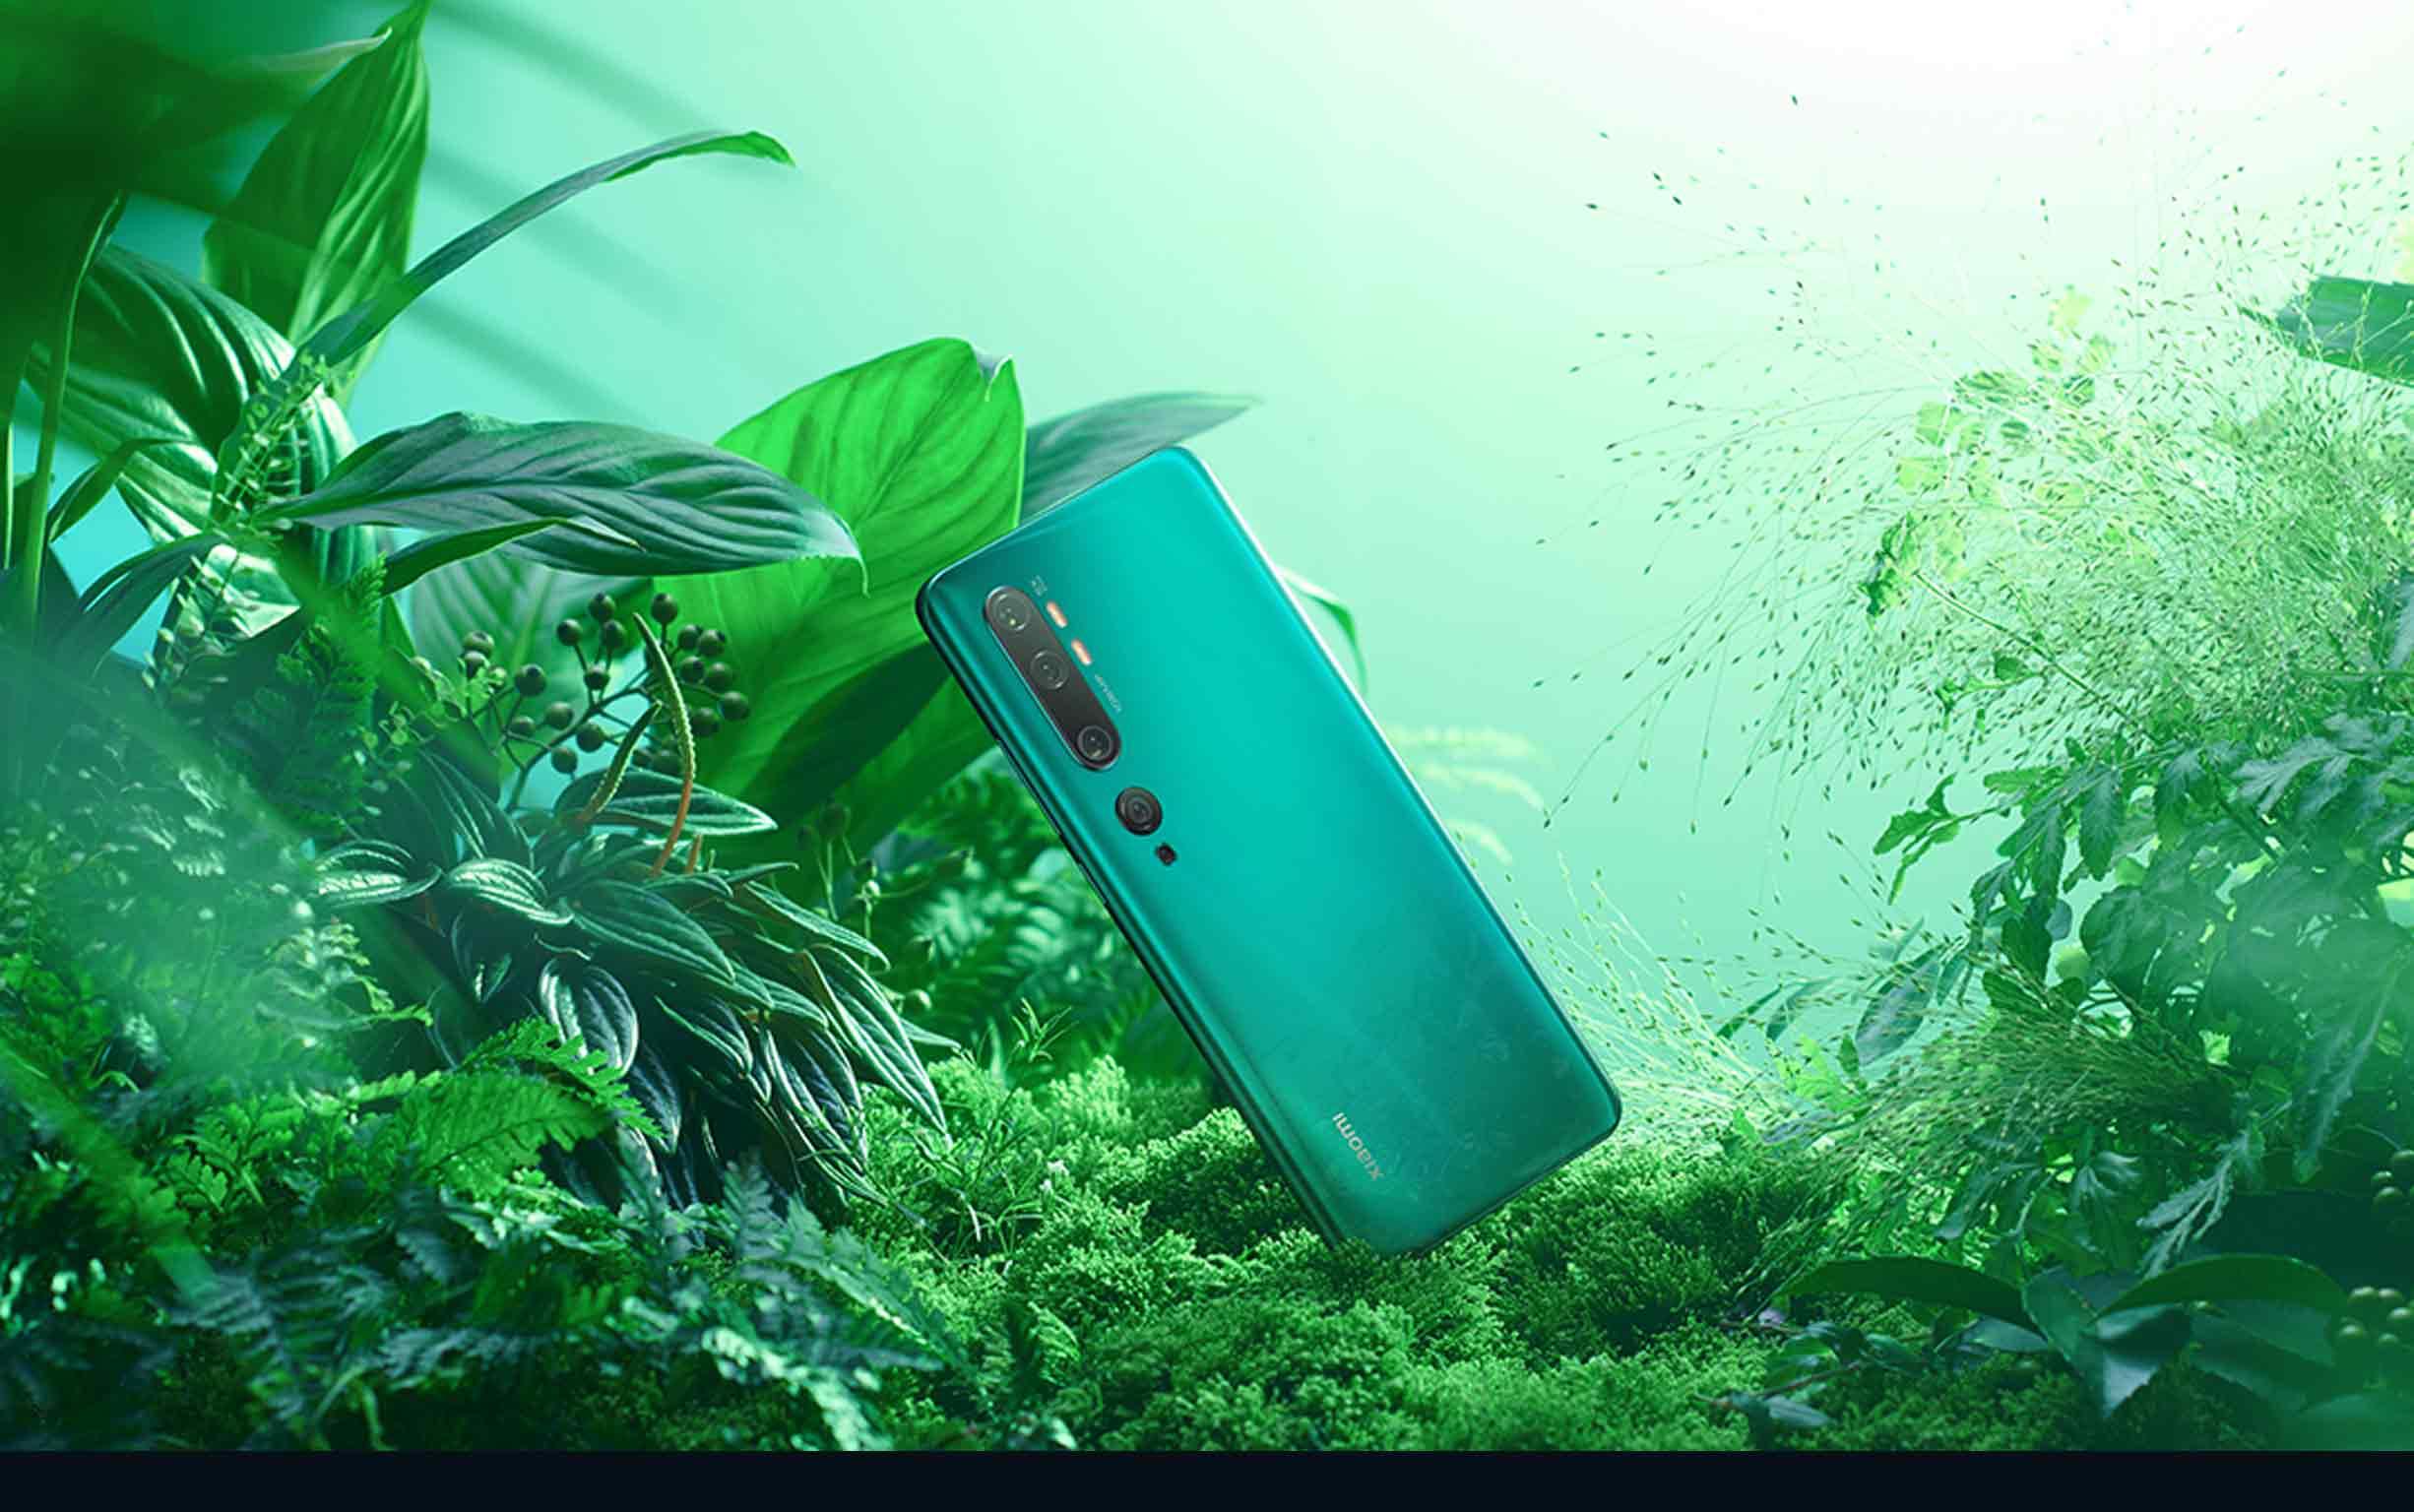 Xiaomi Mi CC9 Pro launched with 108MP penta-camera setup, Snapdragon 730G